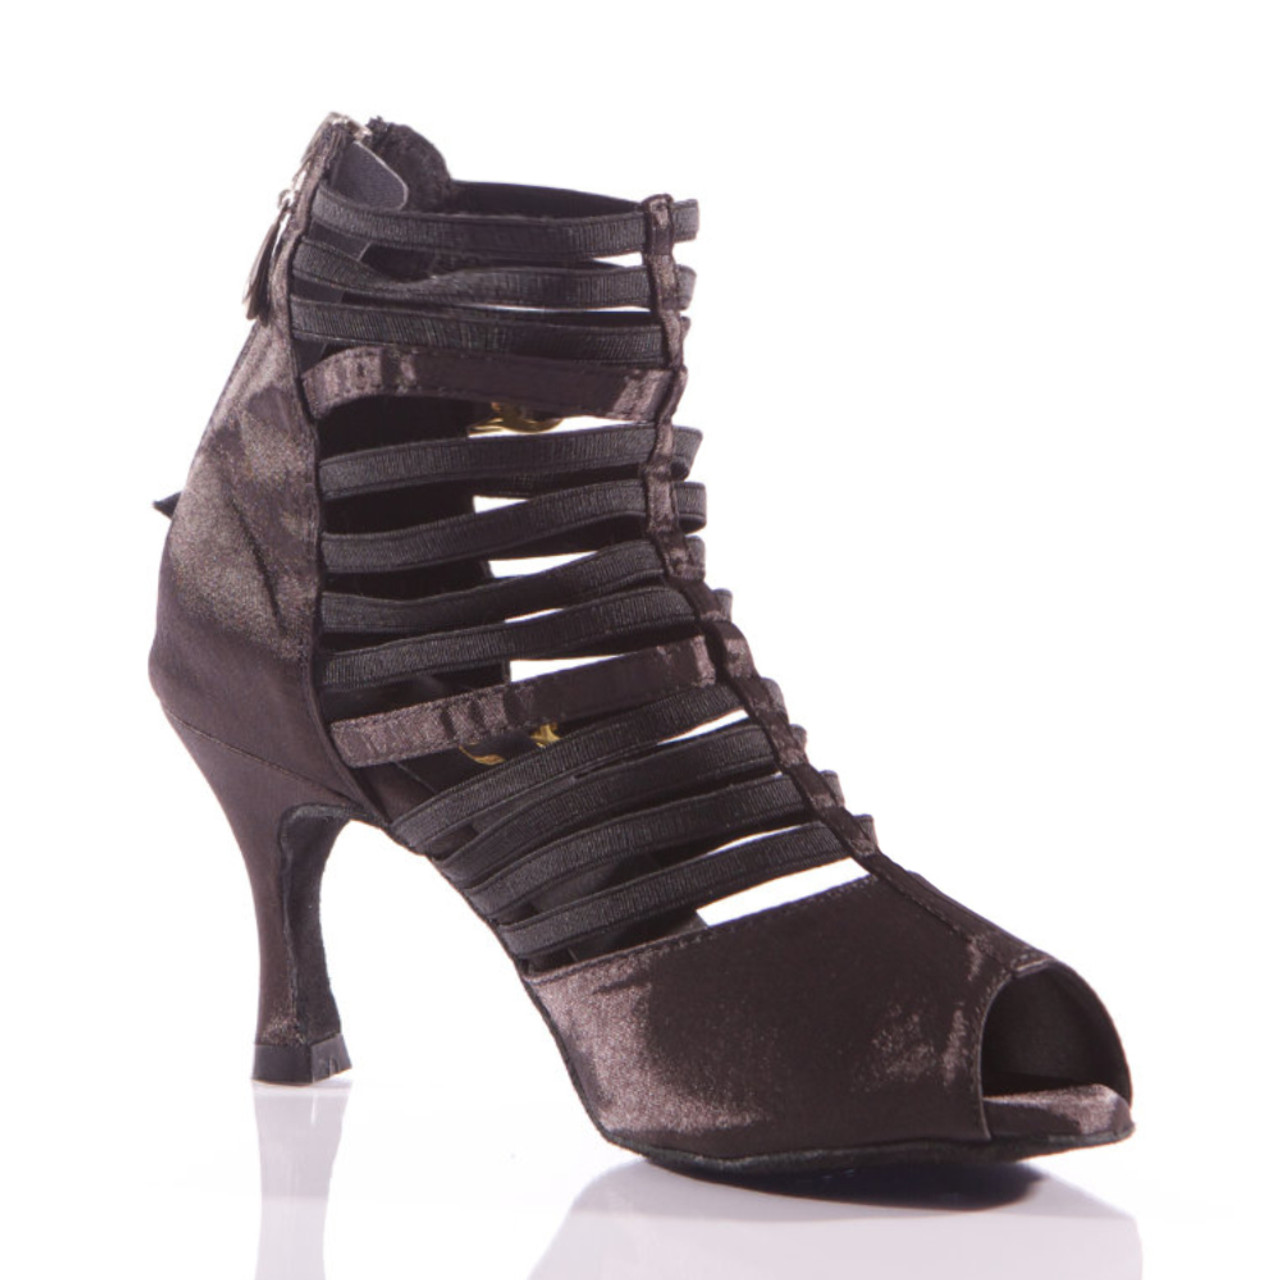 a19ef6d24 Relle - Open Toe Elastic Strappy Dance Shoe - 3 inch Flared Heels - Burju  Shoes